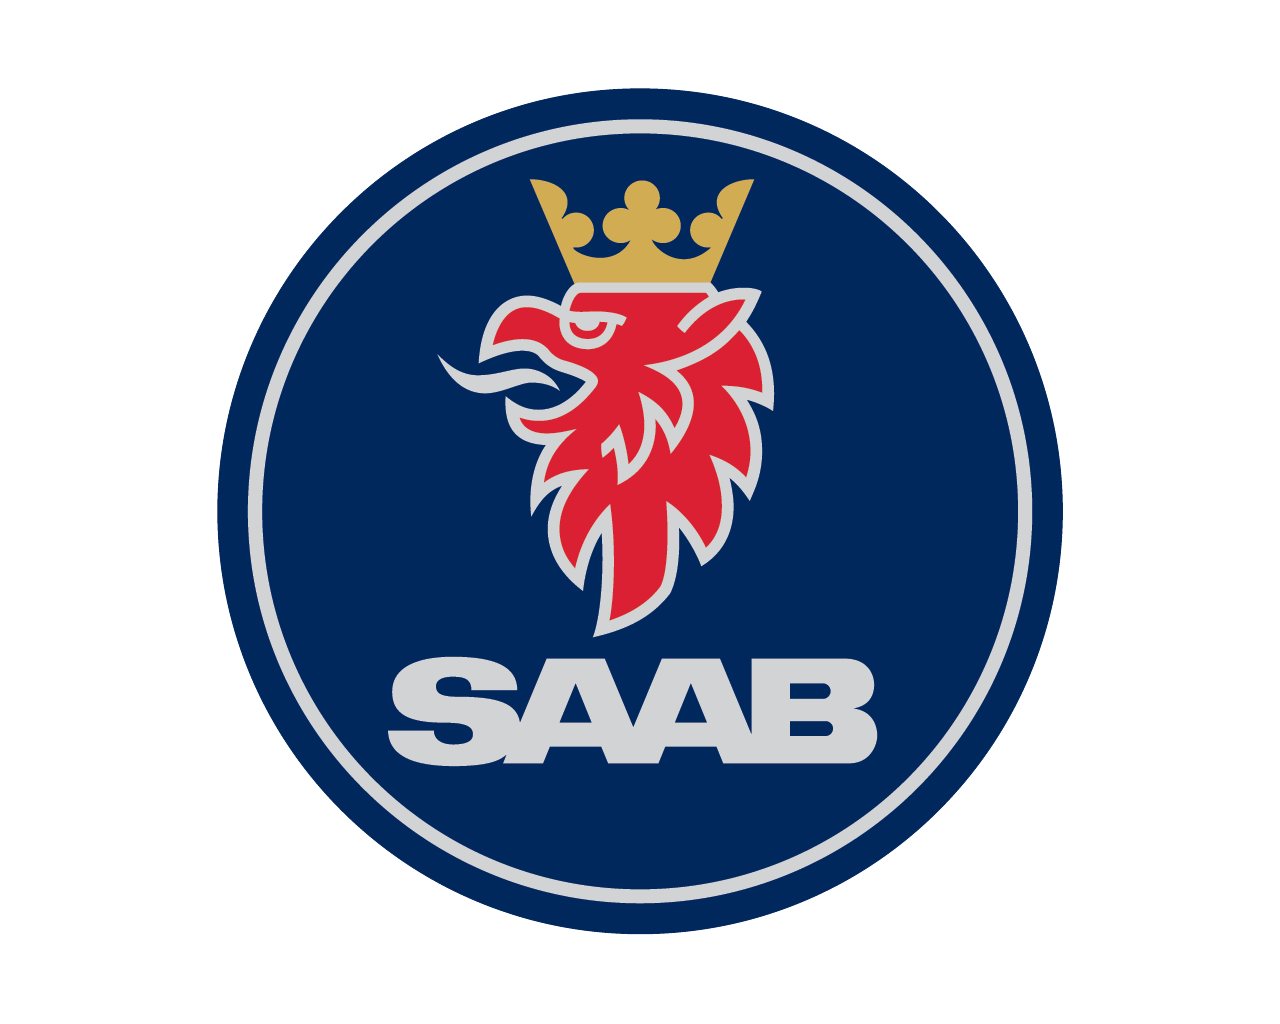 логотип сааб фото